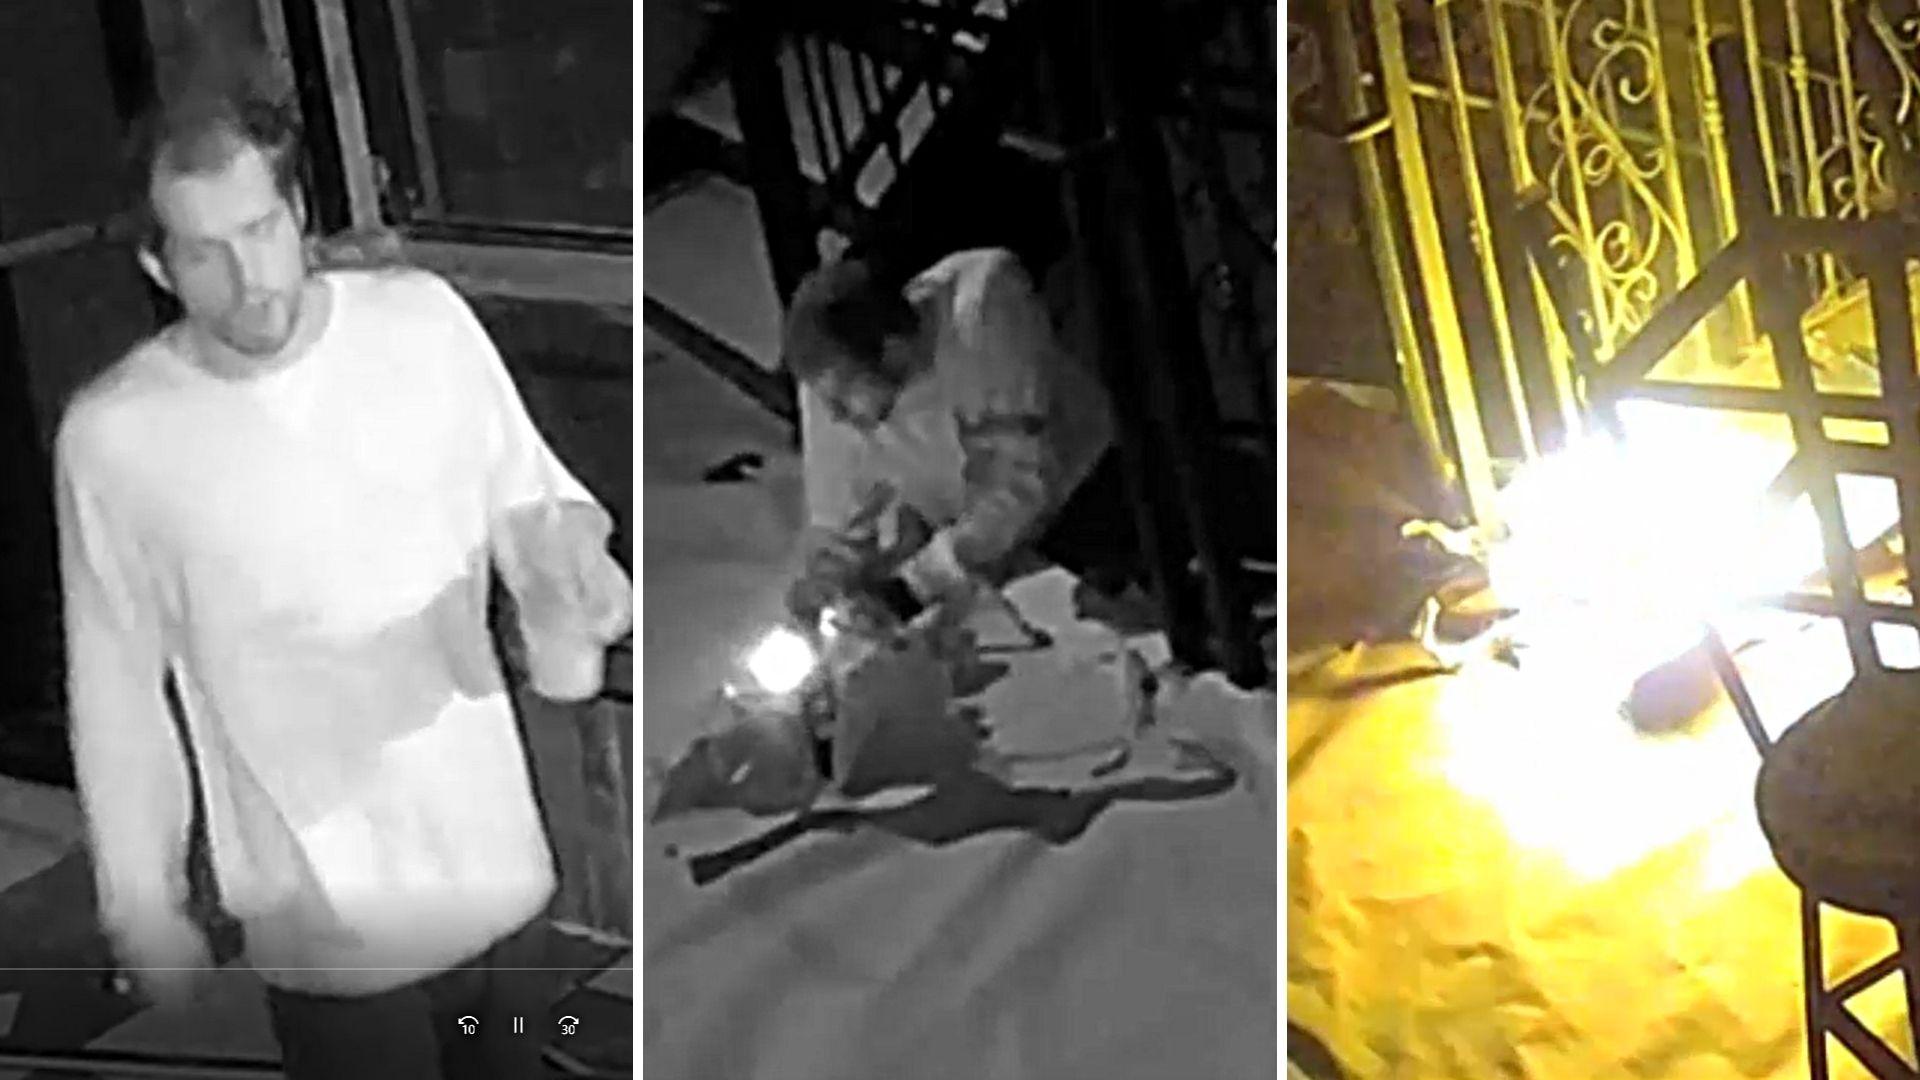 Man starts fire in Manhattan bar